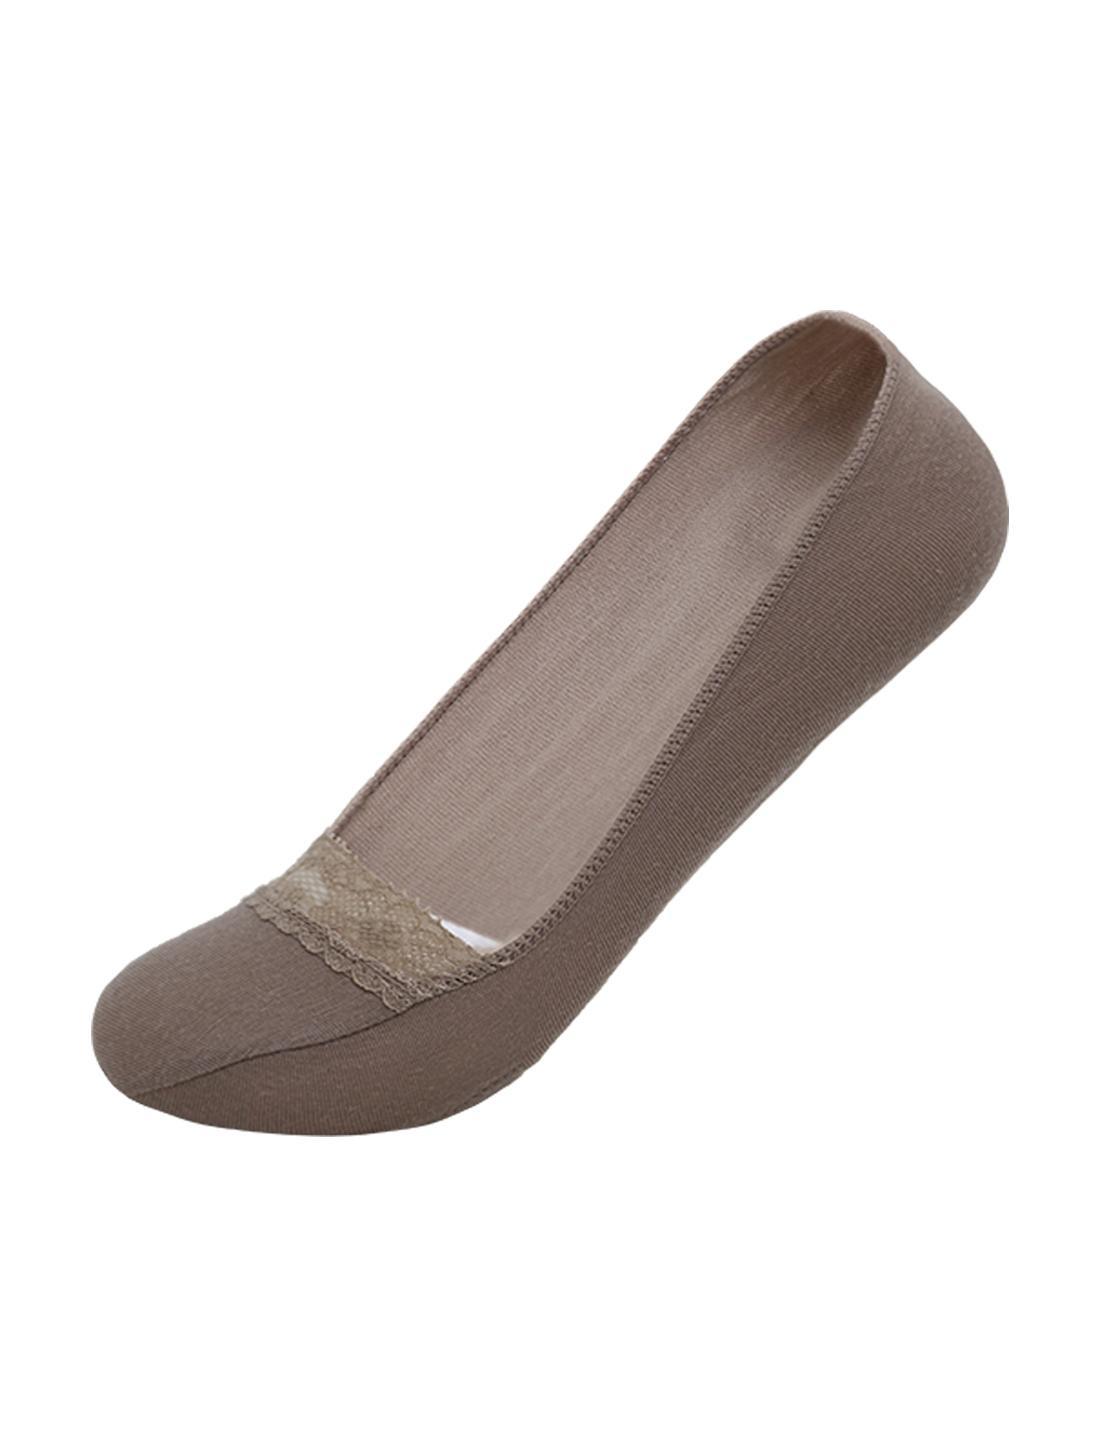 Ladies-Printed-Padded-Detail-Lace-Decor-Boat-Socks-10-12